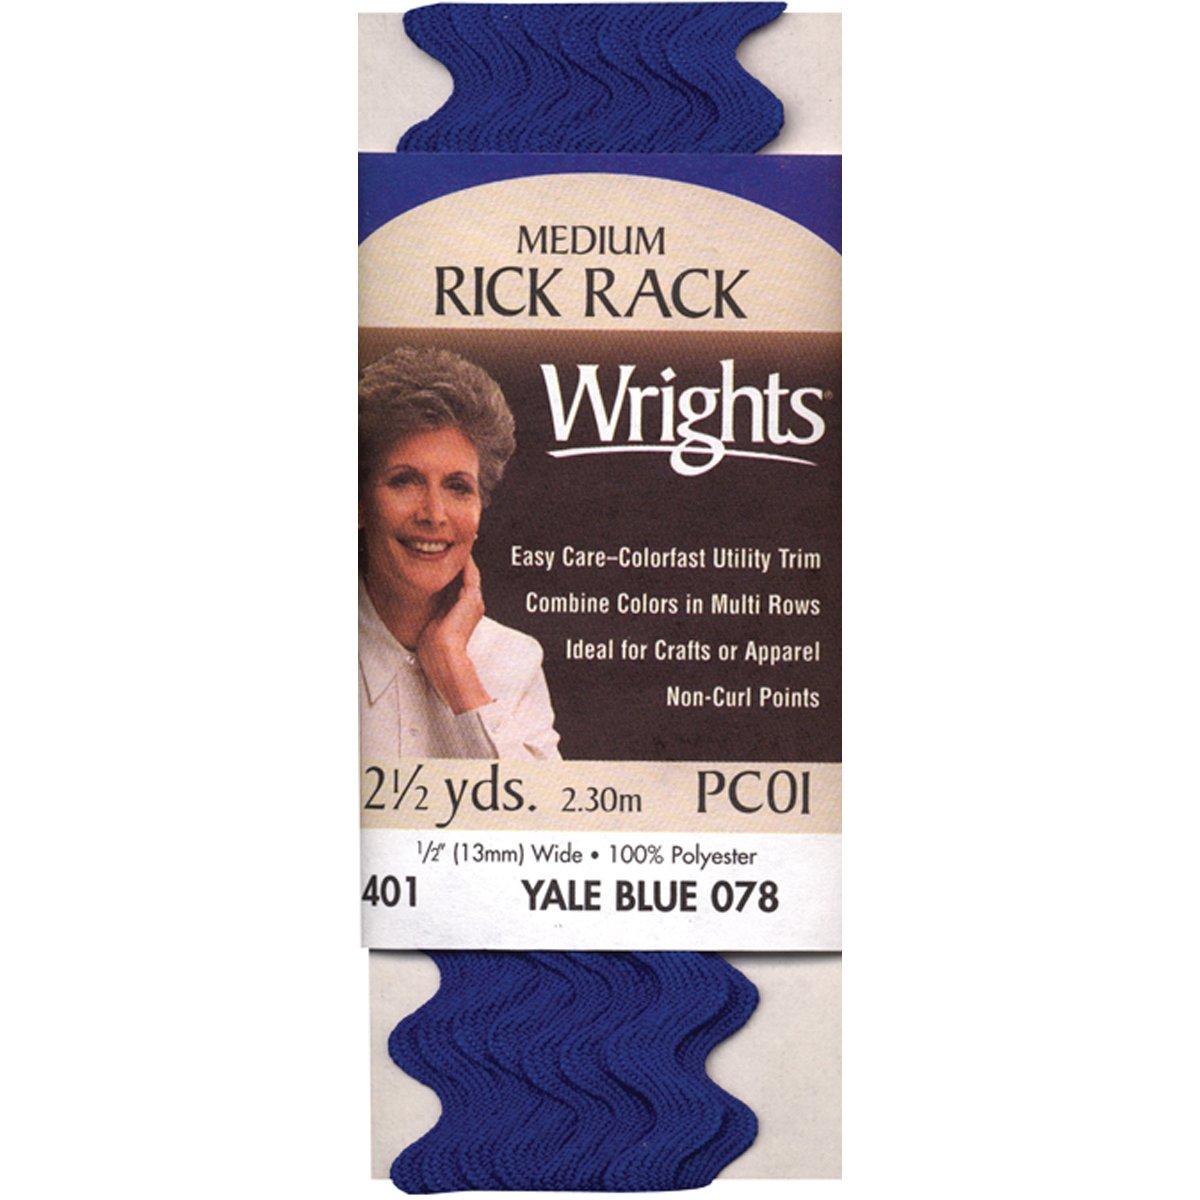 2,3/m 030/Polyester Rick Rack Trim 401 Blanc Medium Wrights 117